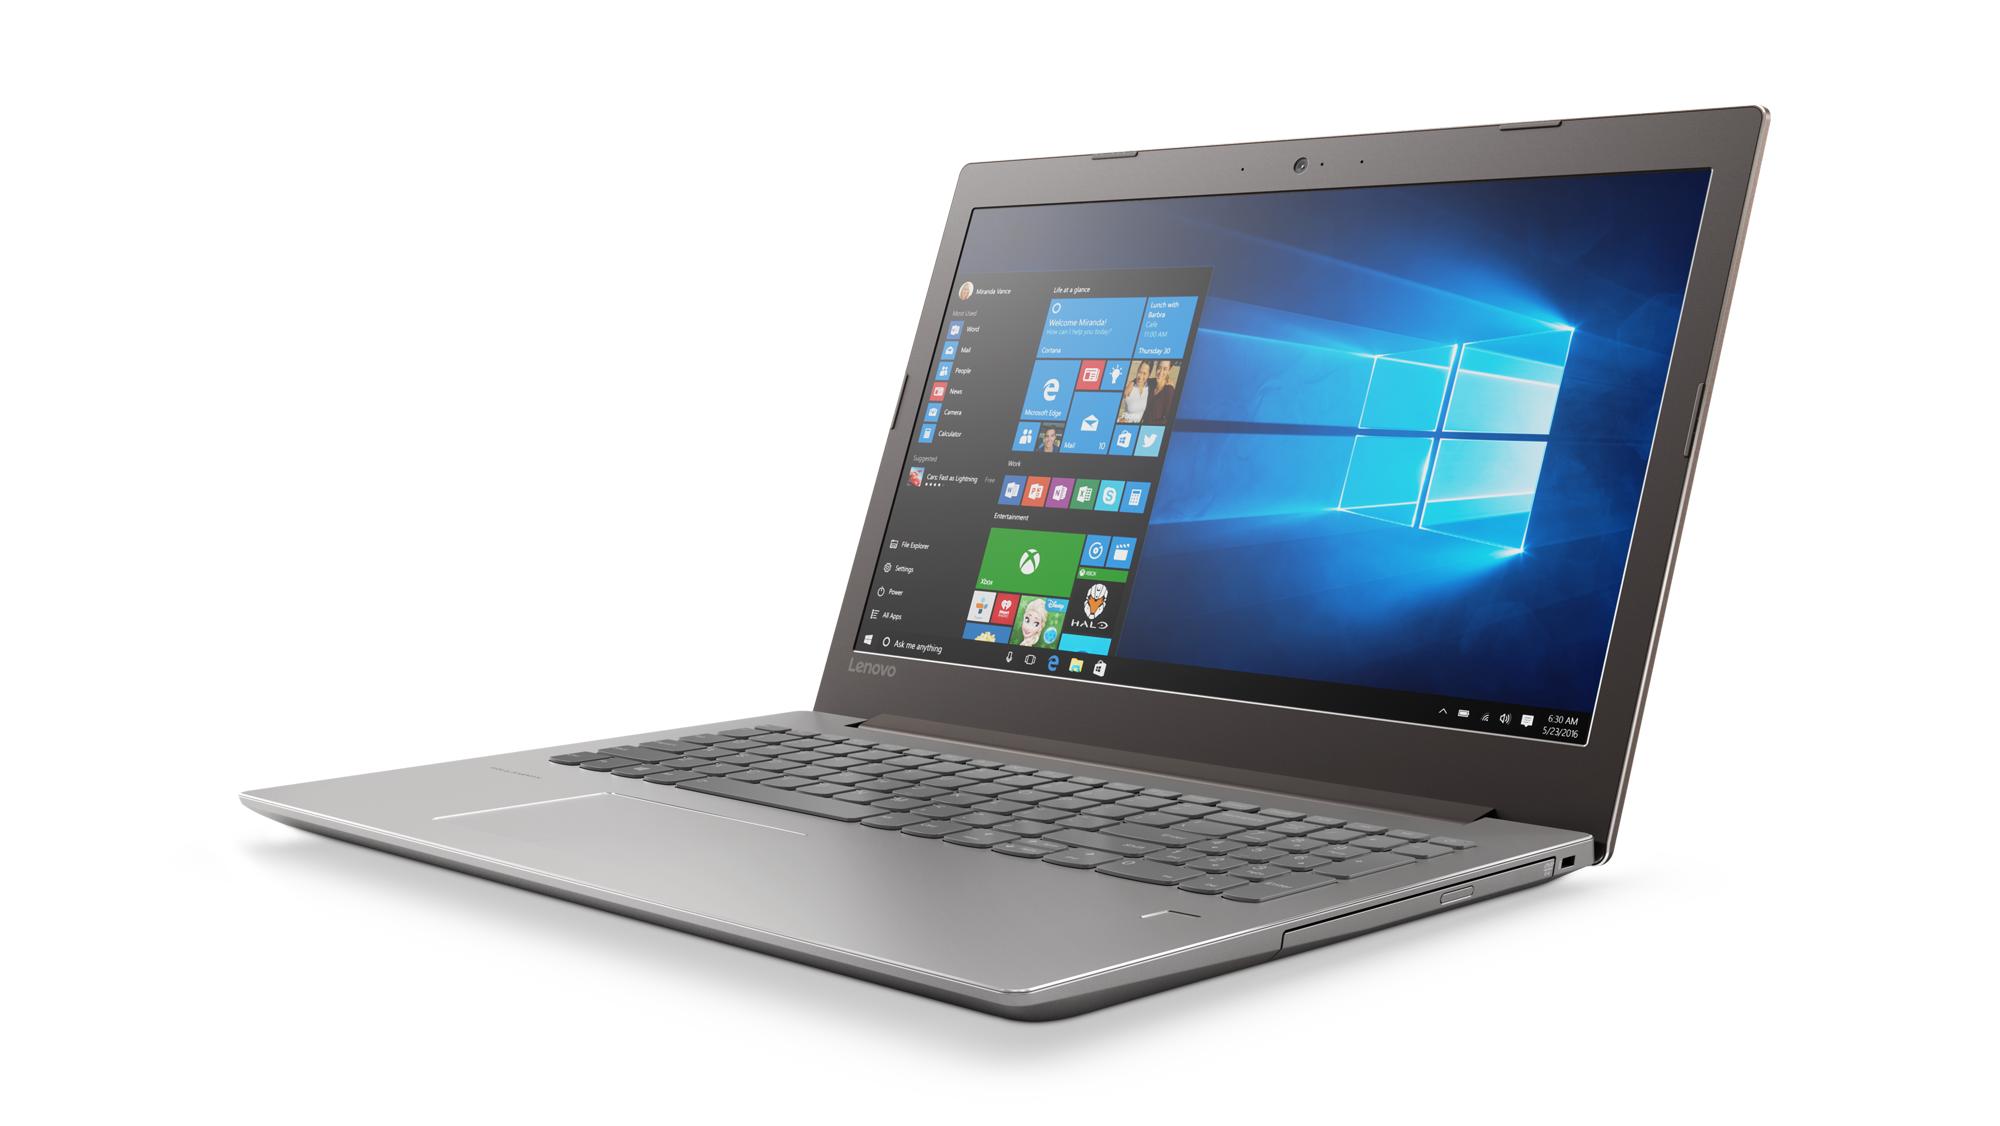 "Lenovo IdeaPad 520-15IKB i5-7200U 3,10GHz/8GB/SSD 256GB/15,6"" FHD/IPS/AG/GeForce 4GB/WIN10 bronzová 80YL004MCK"